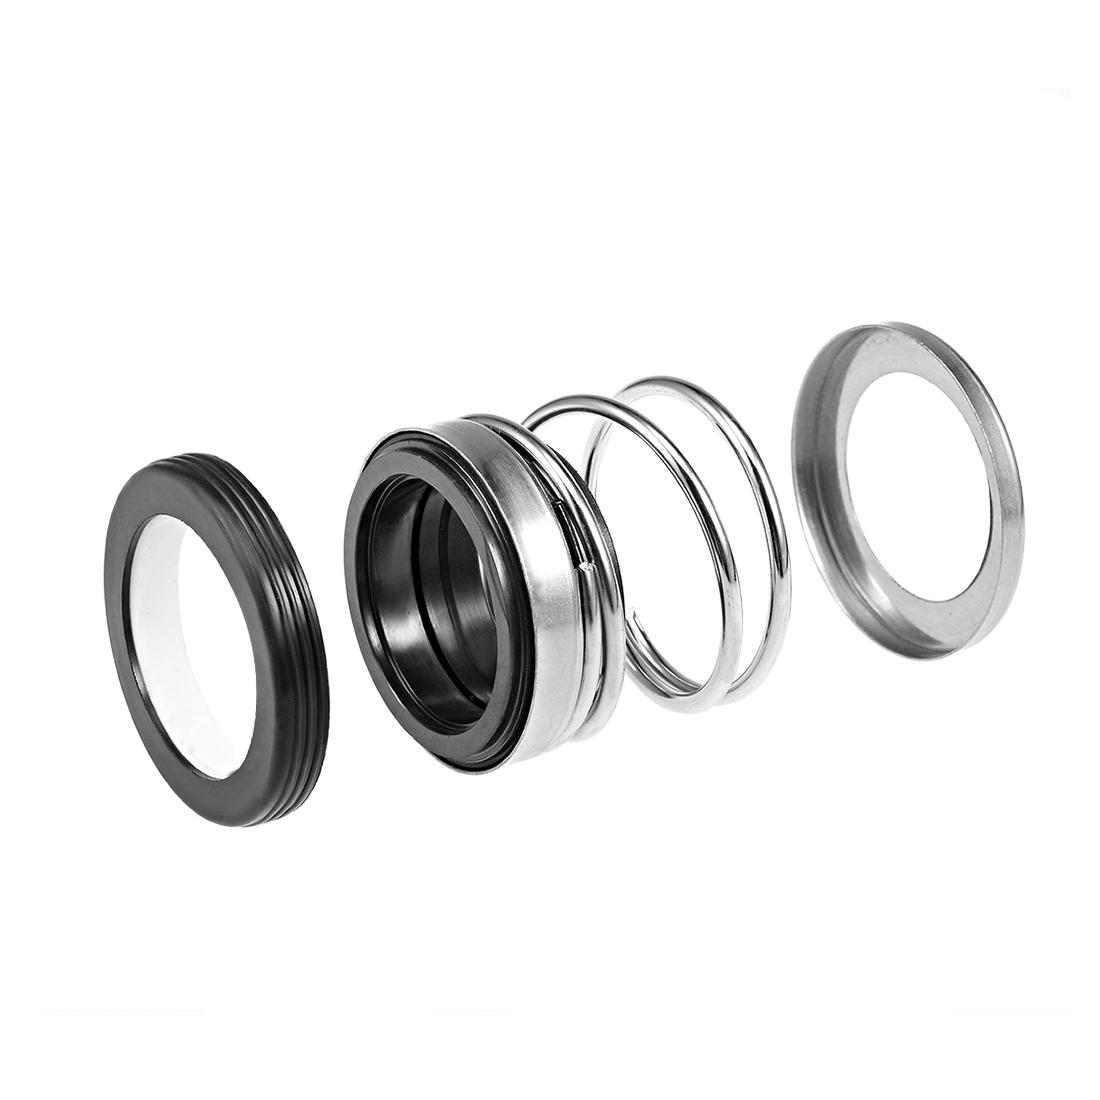 Mechanical Shaft Seal Replacement for Pool Spa Pump 2pcs 108-30 - image 2 de 4